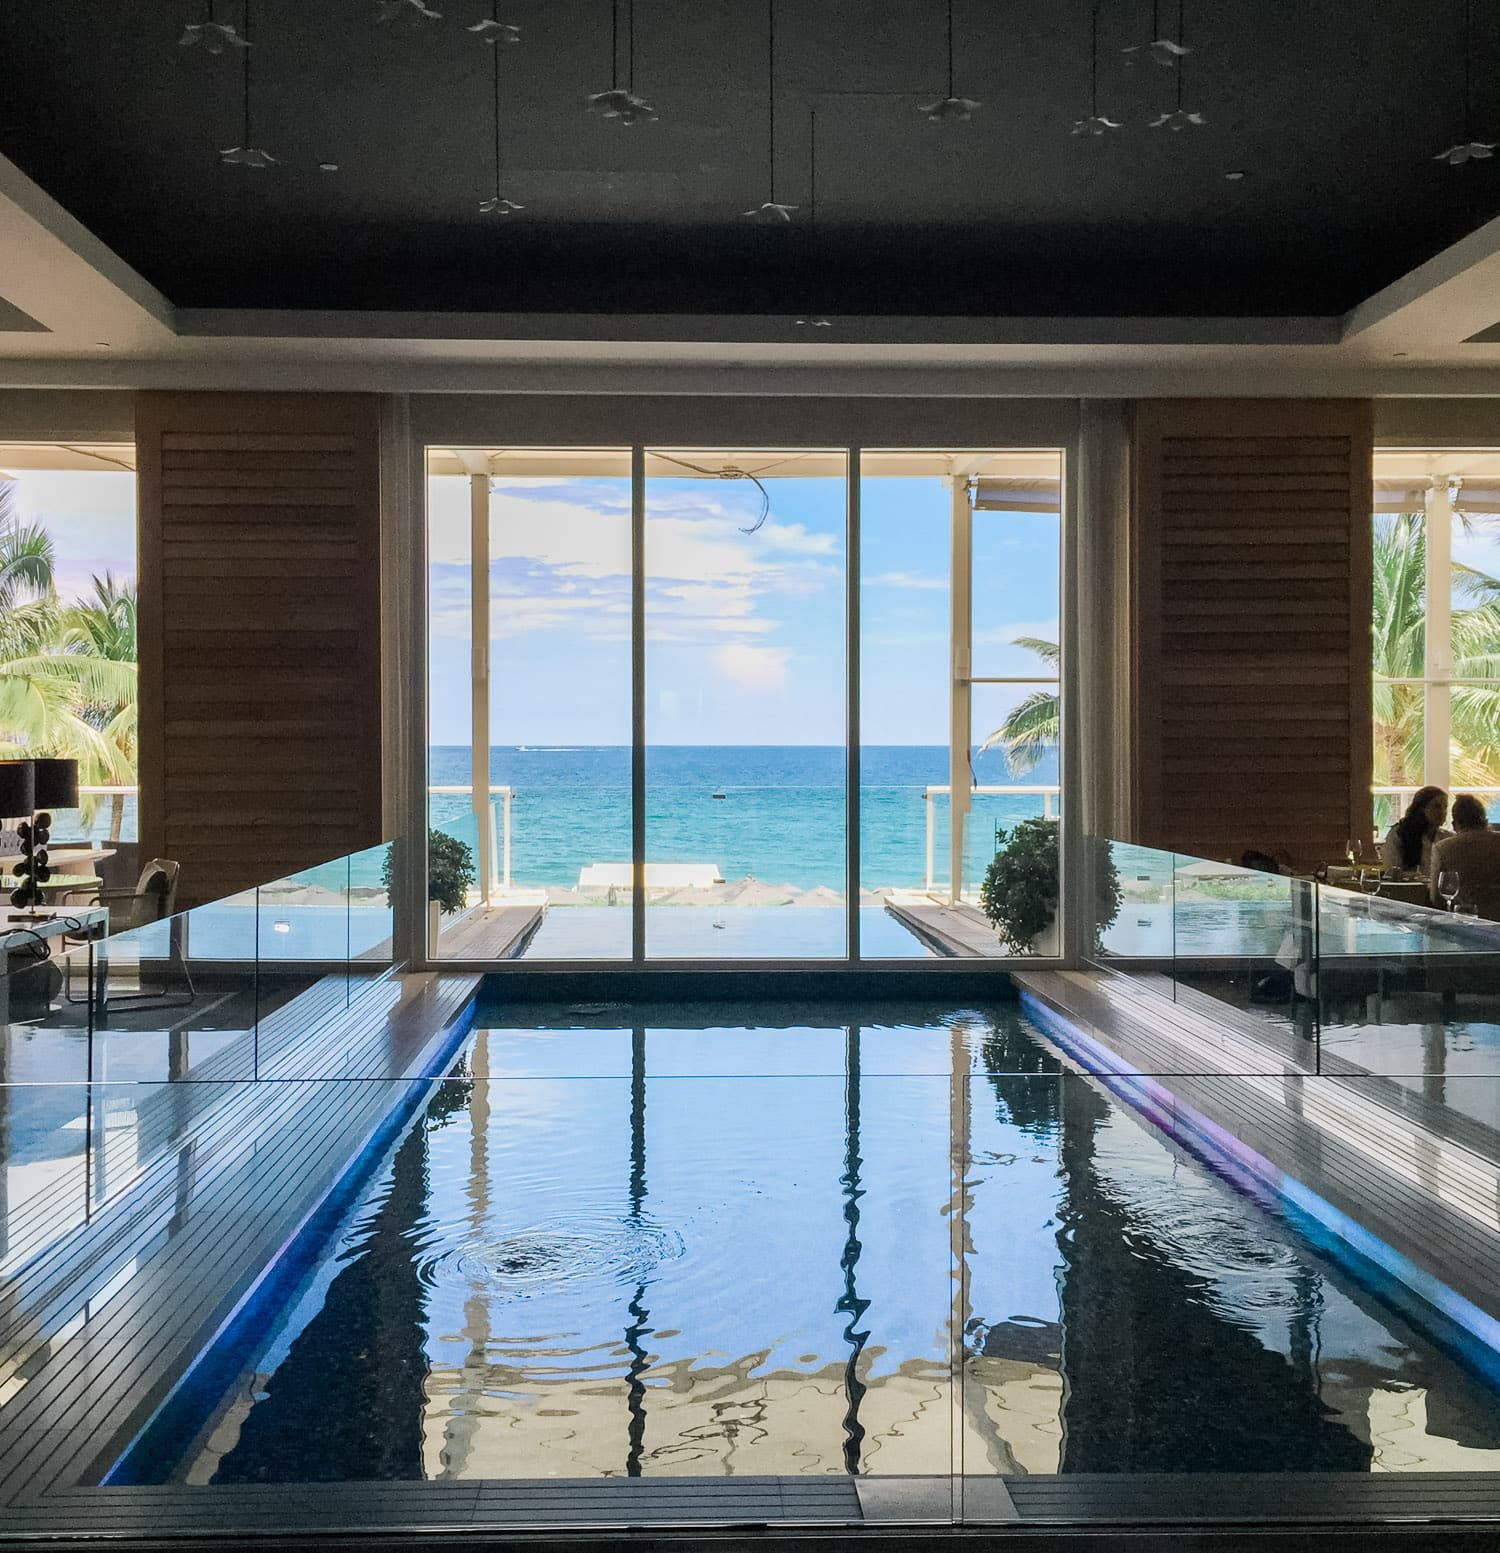 Boca Beach Club views + A full review of the Boca Raton Resort & Club by blogger Ashley Brooke Nicholas